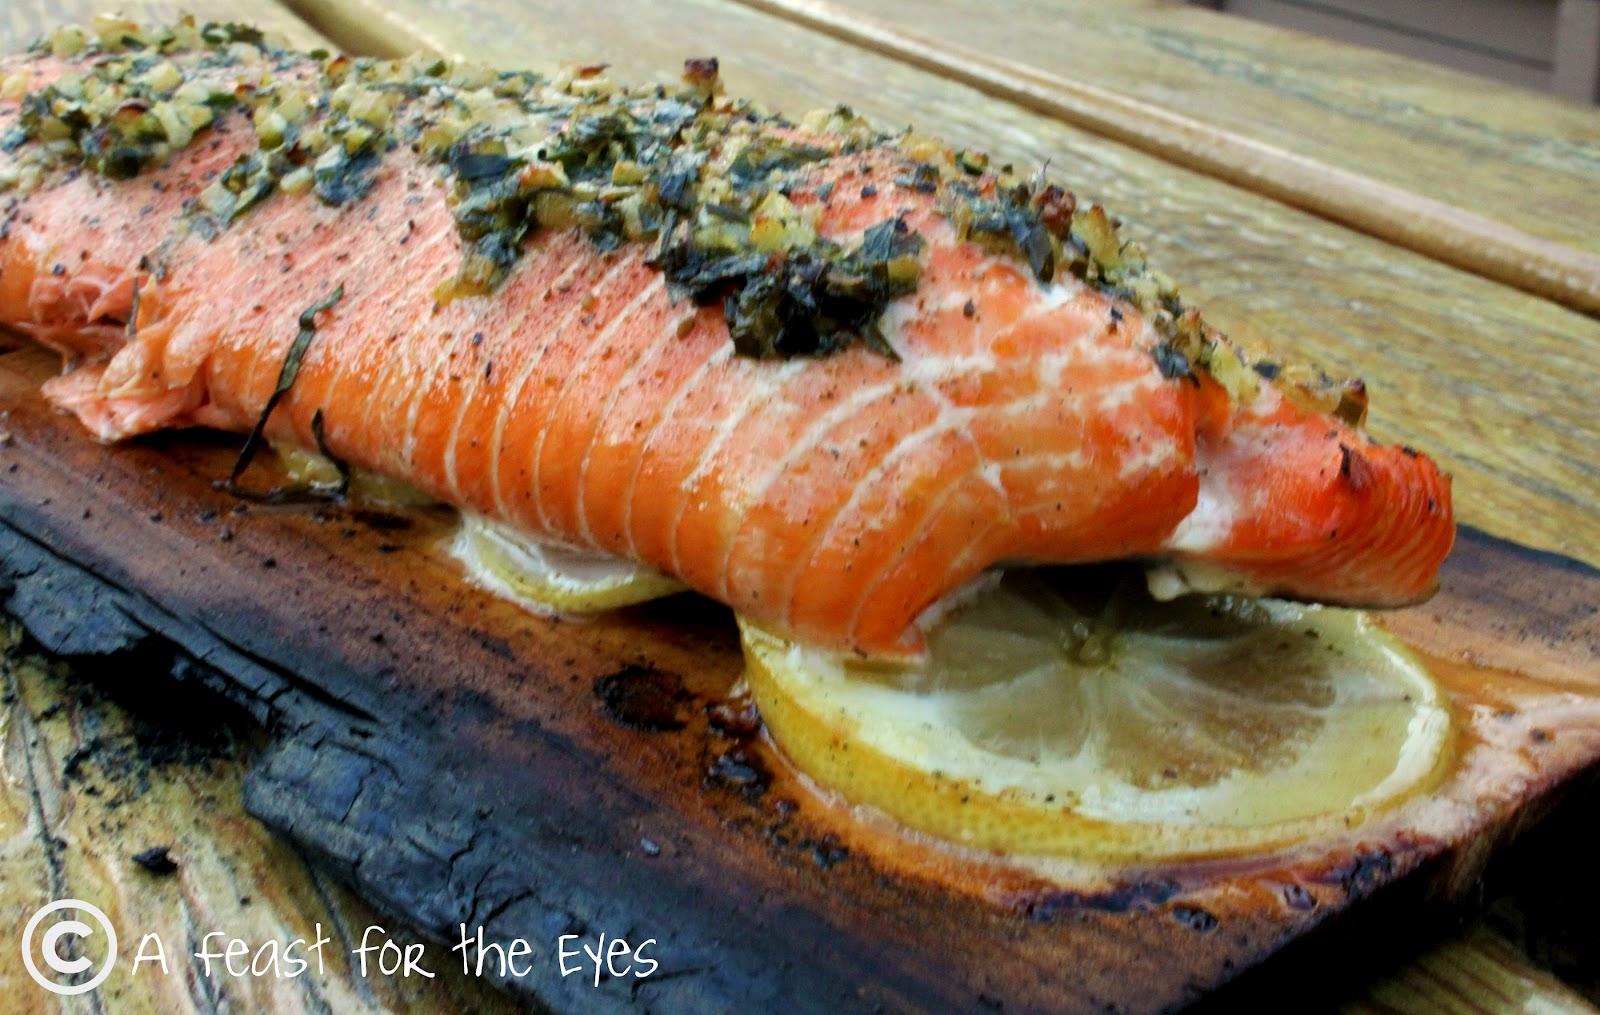 Feast for the Eyes: Cedar Plank Grilled Salmon With Tarragon Herbs